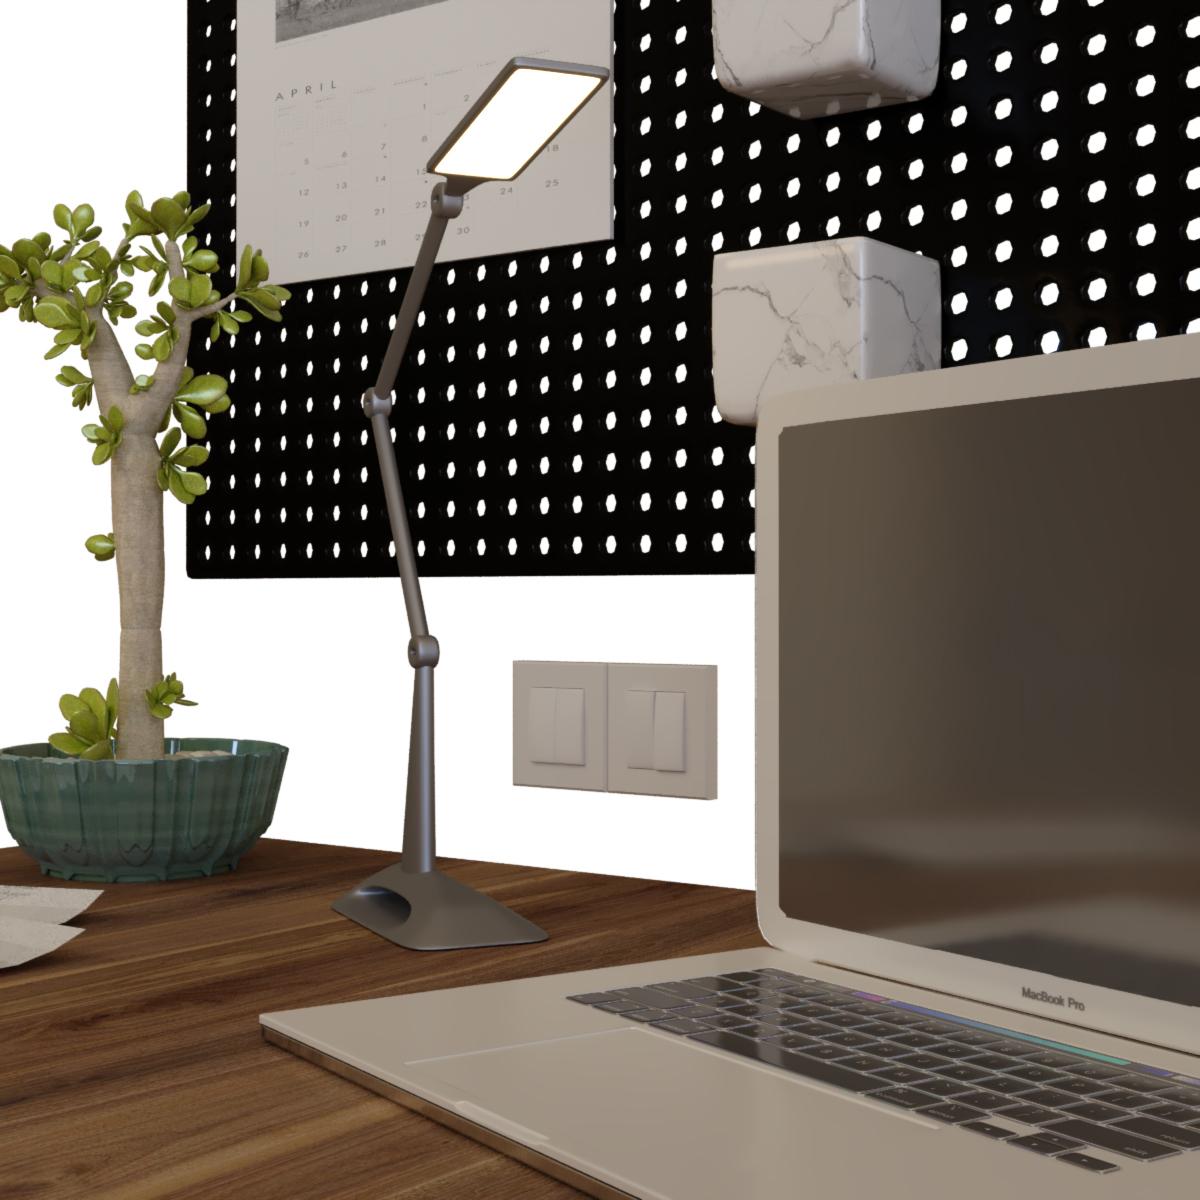 3.jpg Download STL file offfice üorkplace 3 • Design to 3D print, unisjamavari